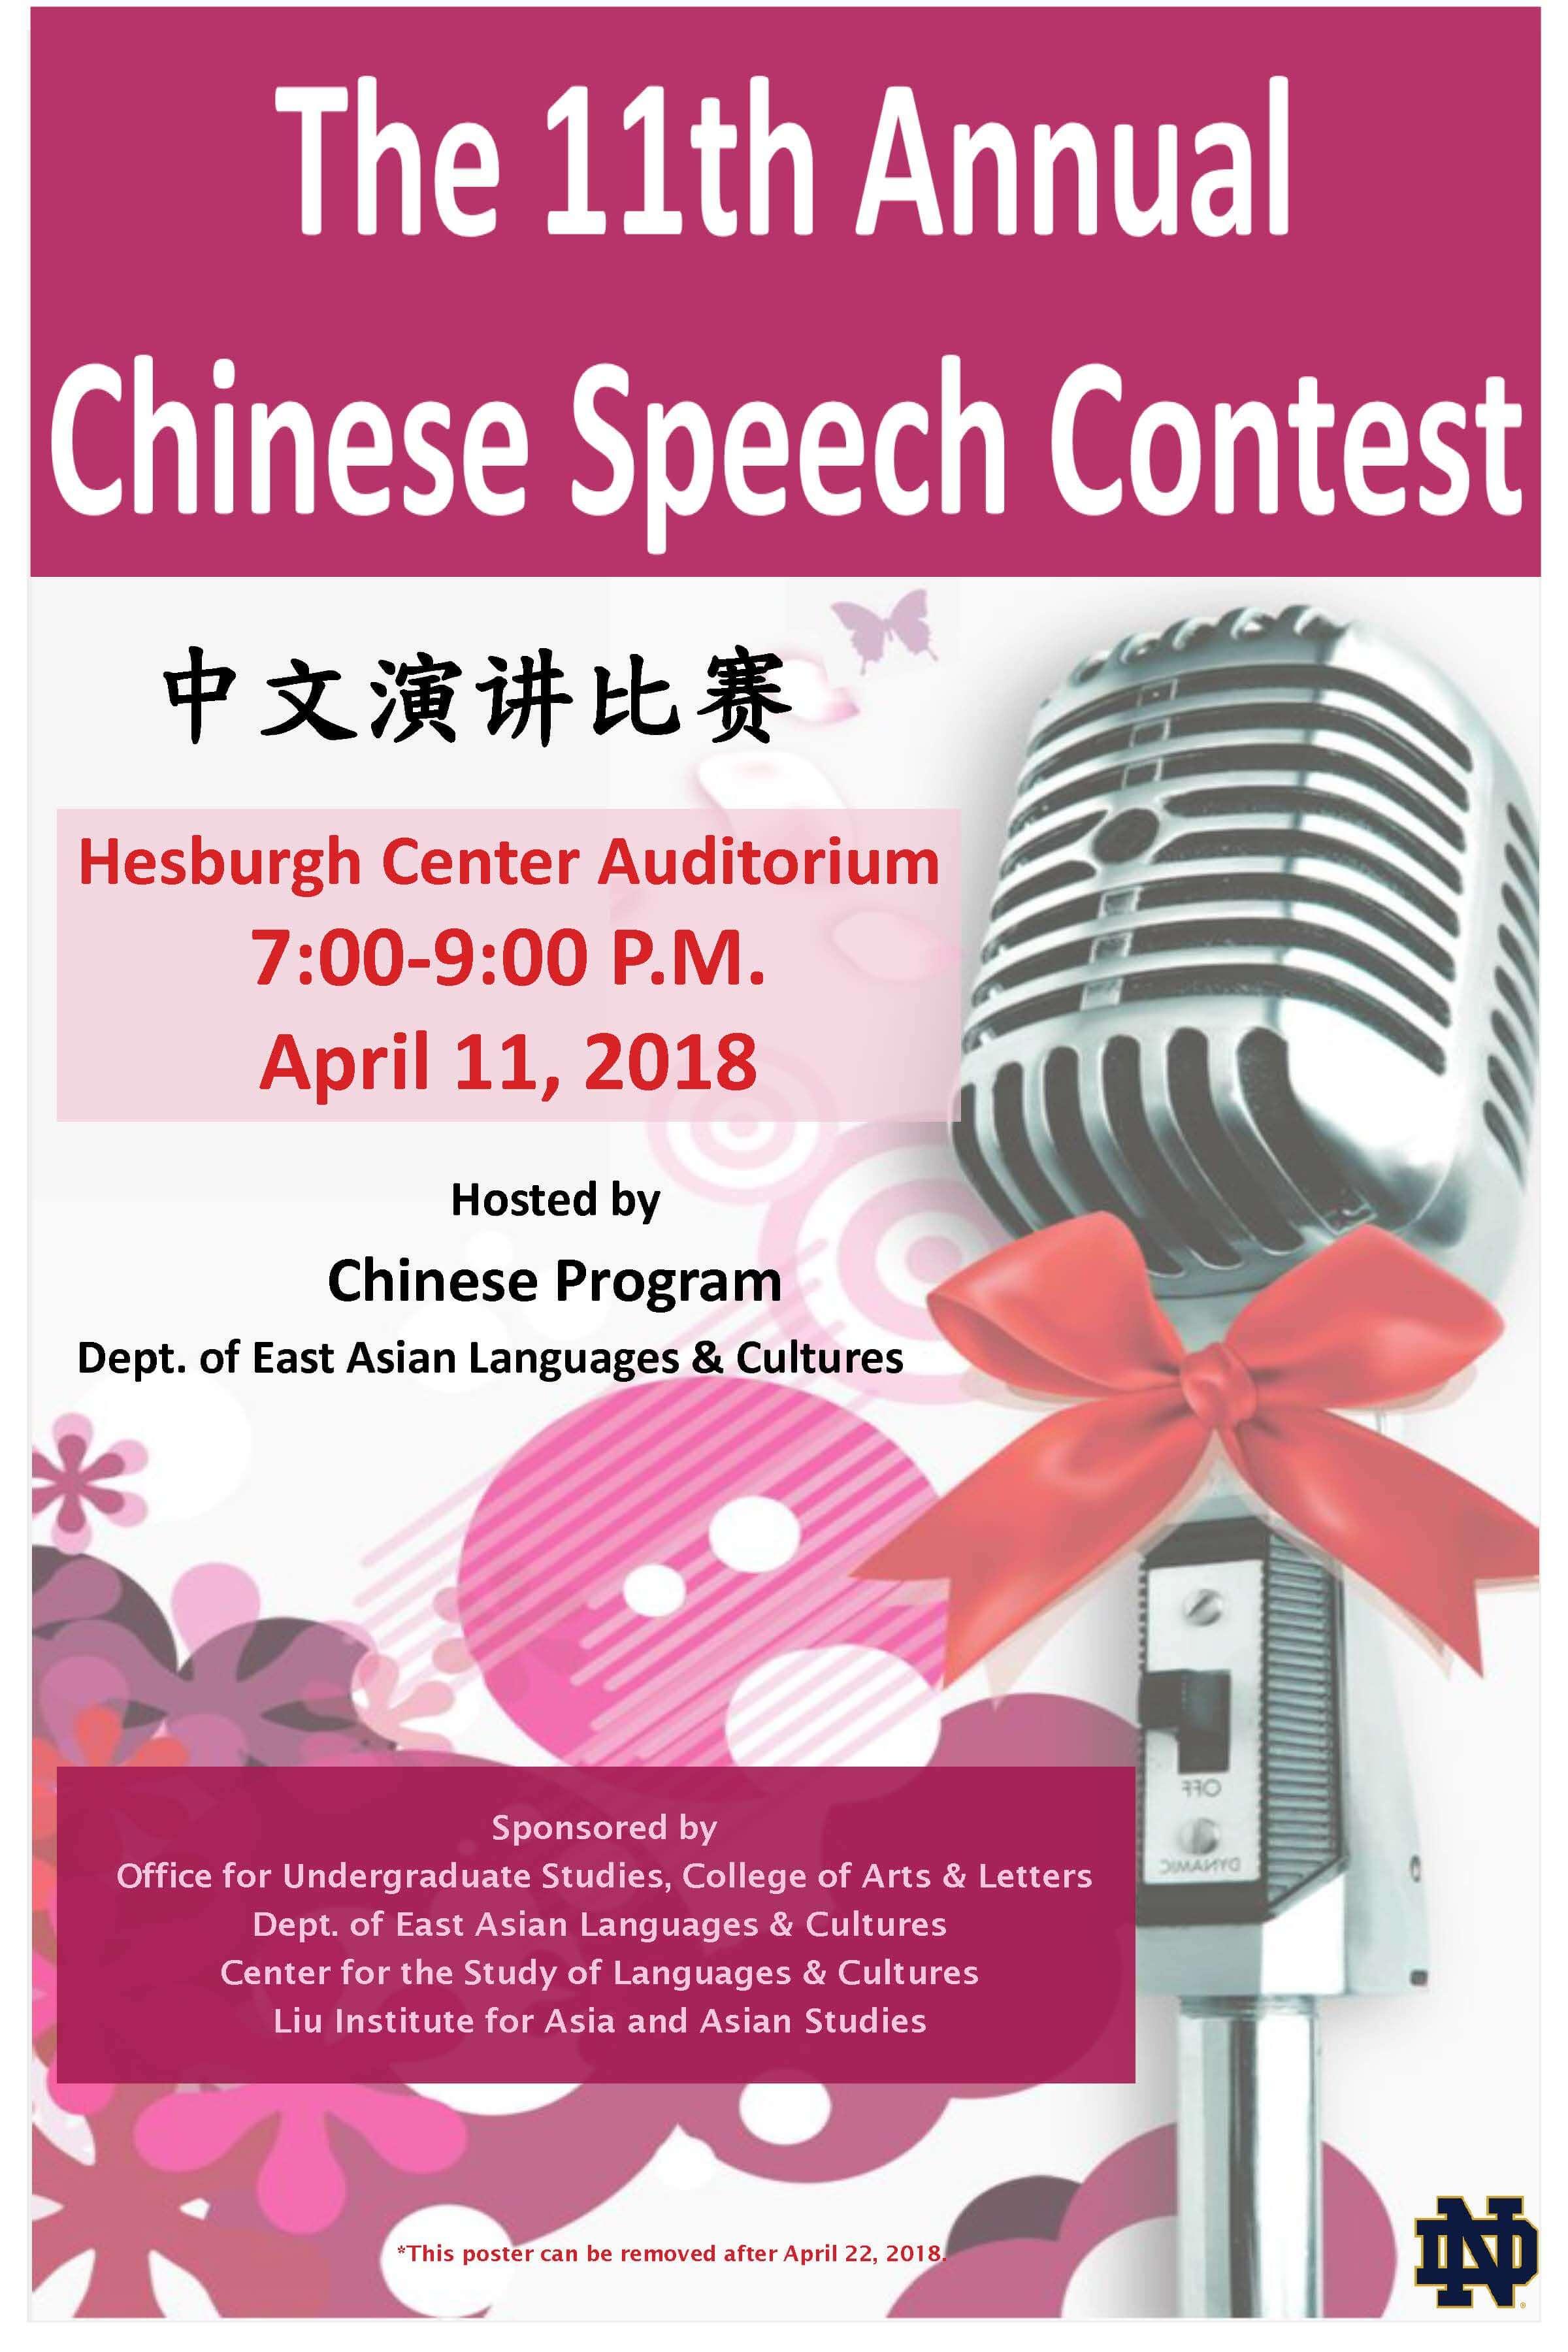 Chinese Speech Contest 2018